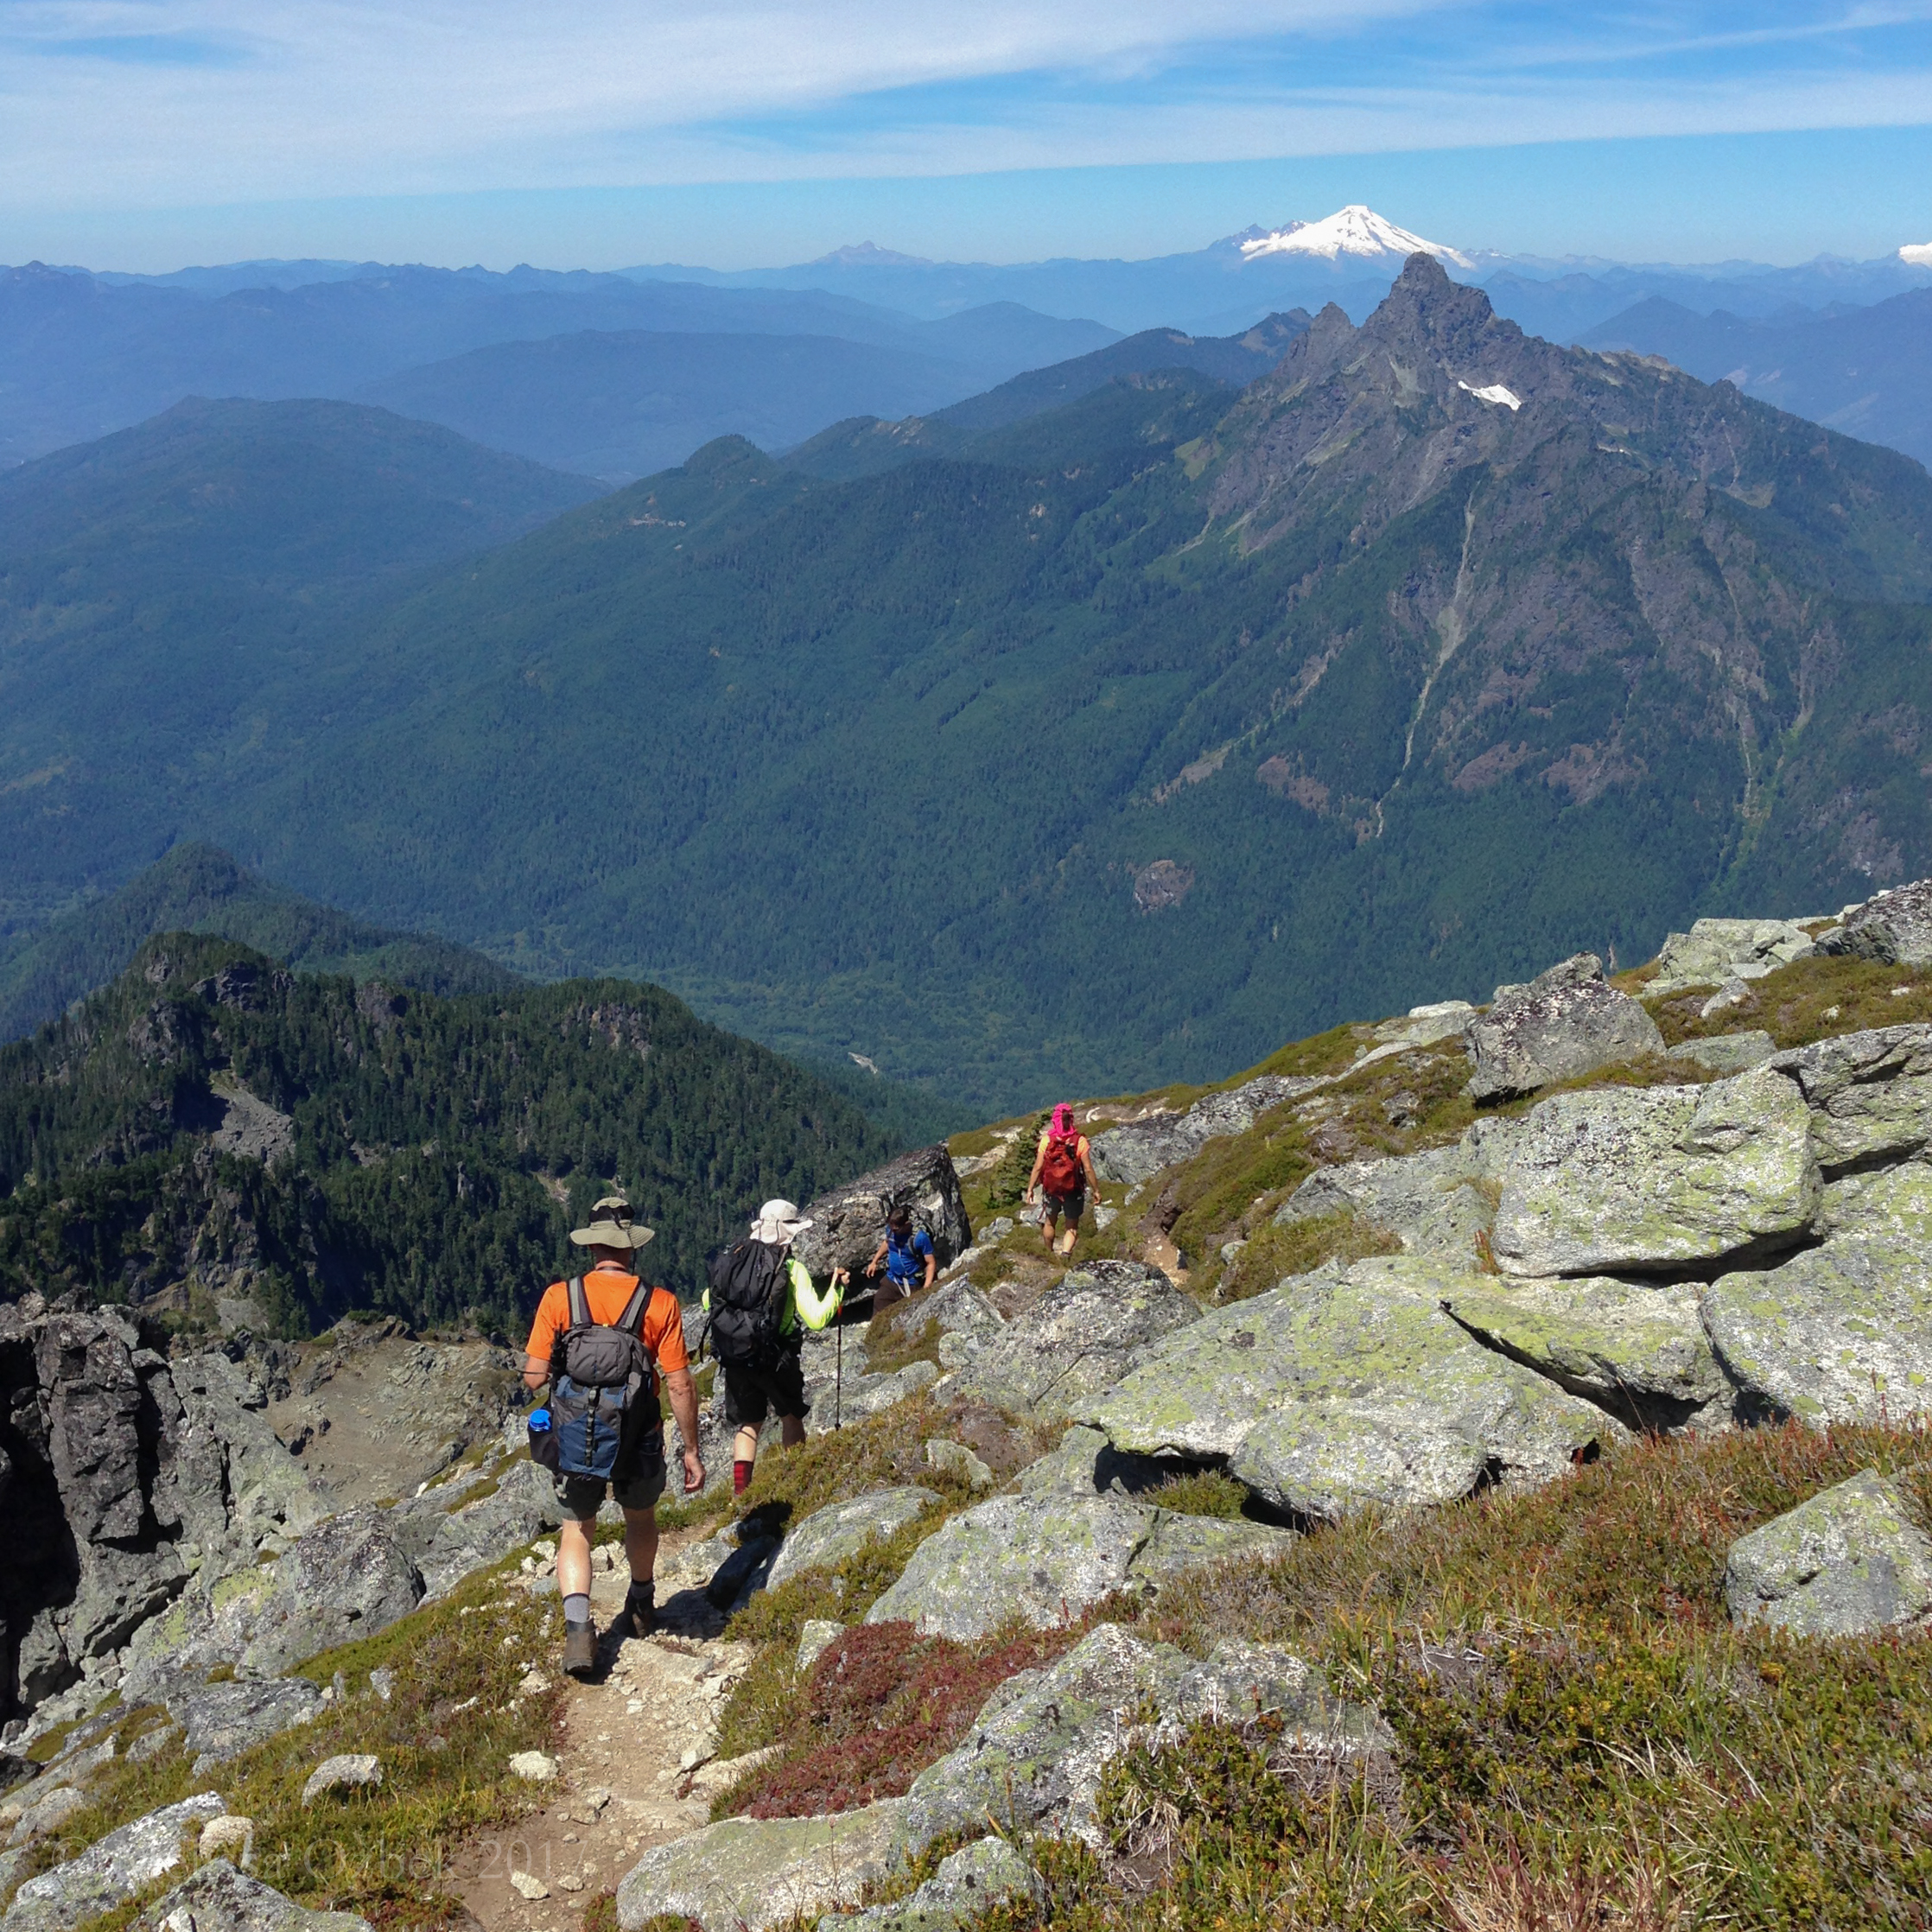 12. Mount Pugh via Stujack Pass